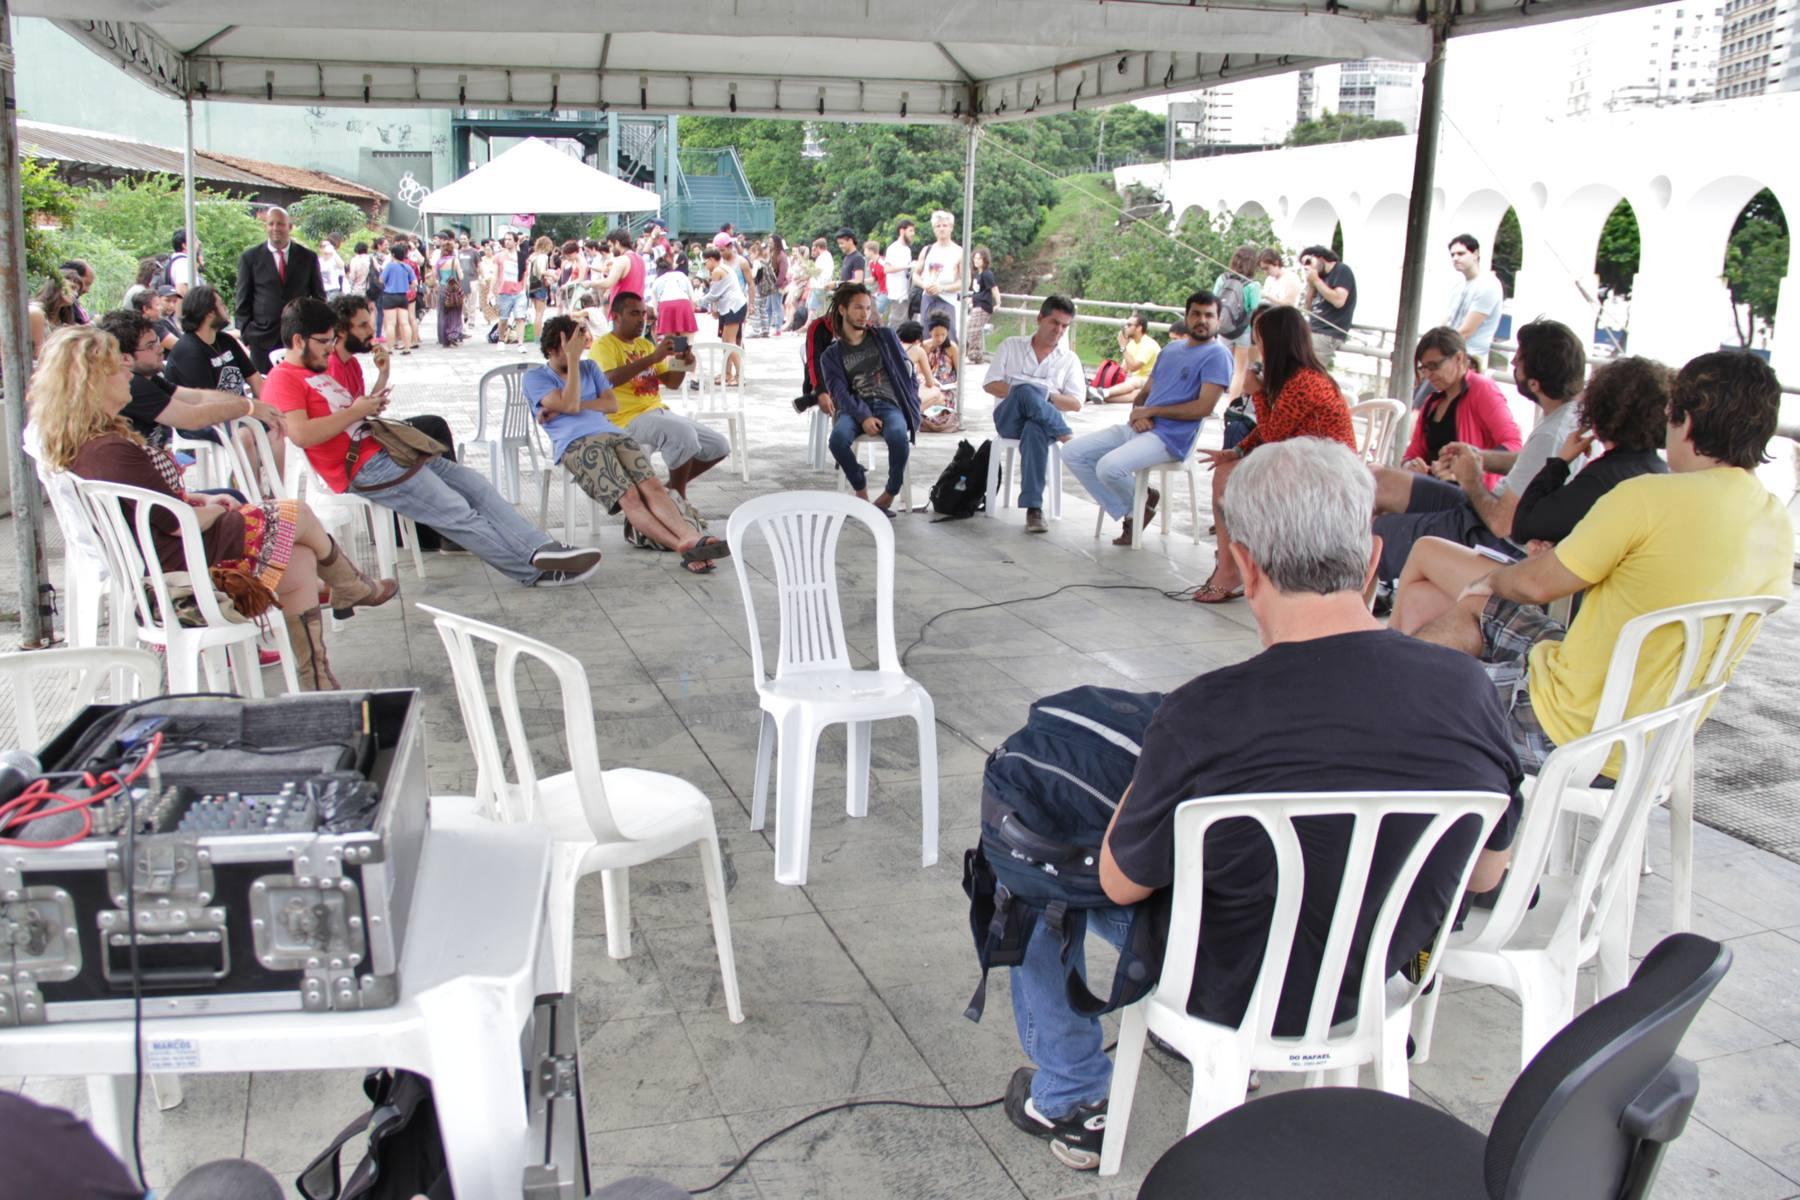 Emergencias_RJ_dez_2015_IMG_0228